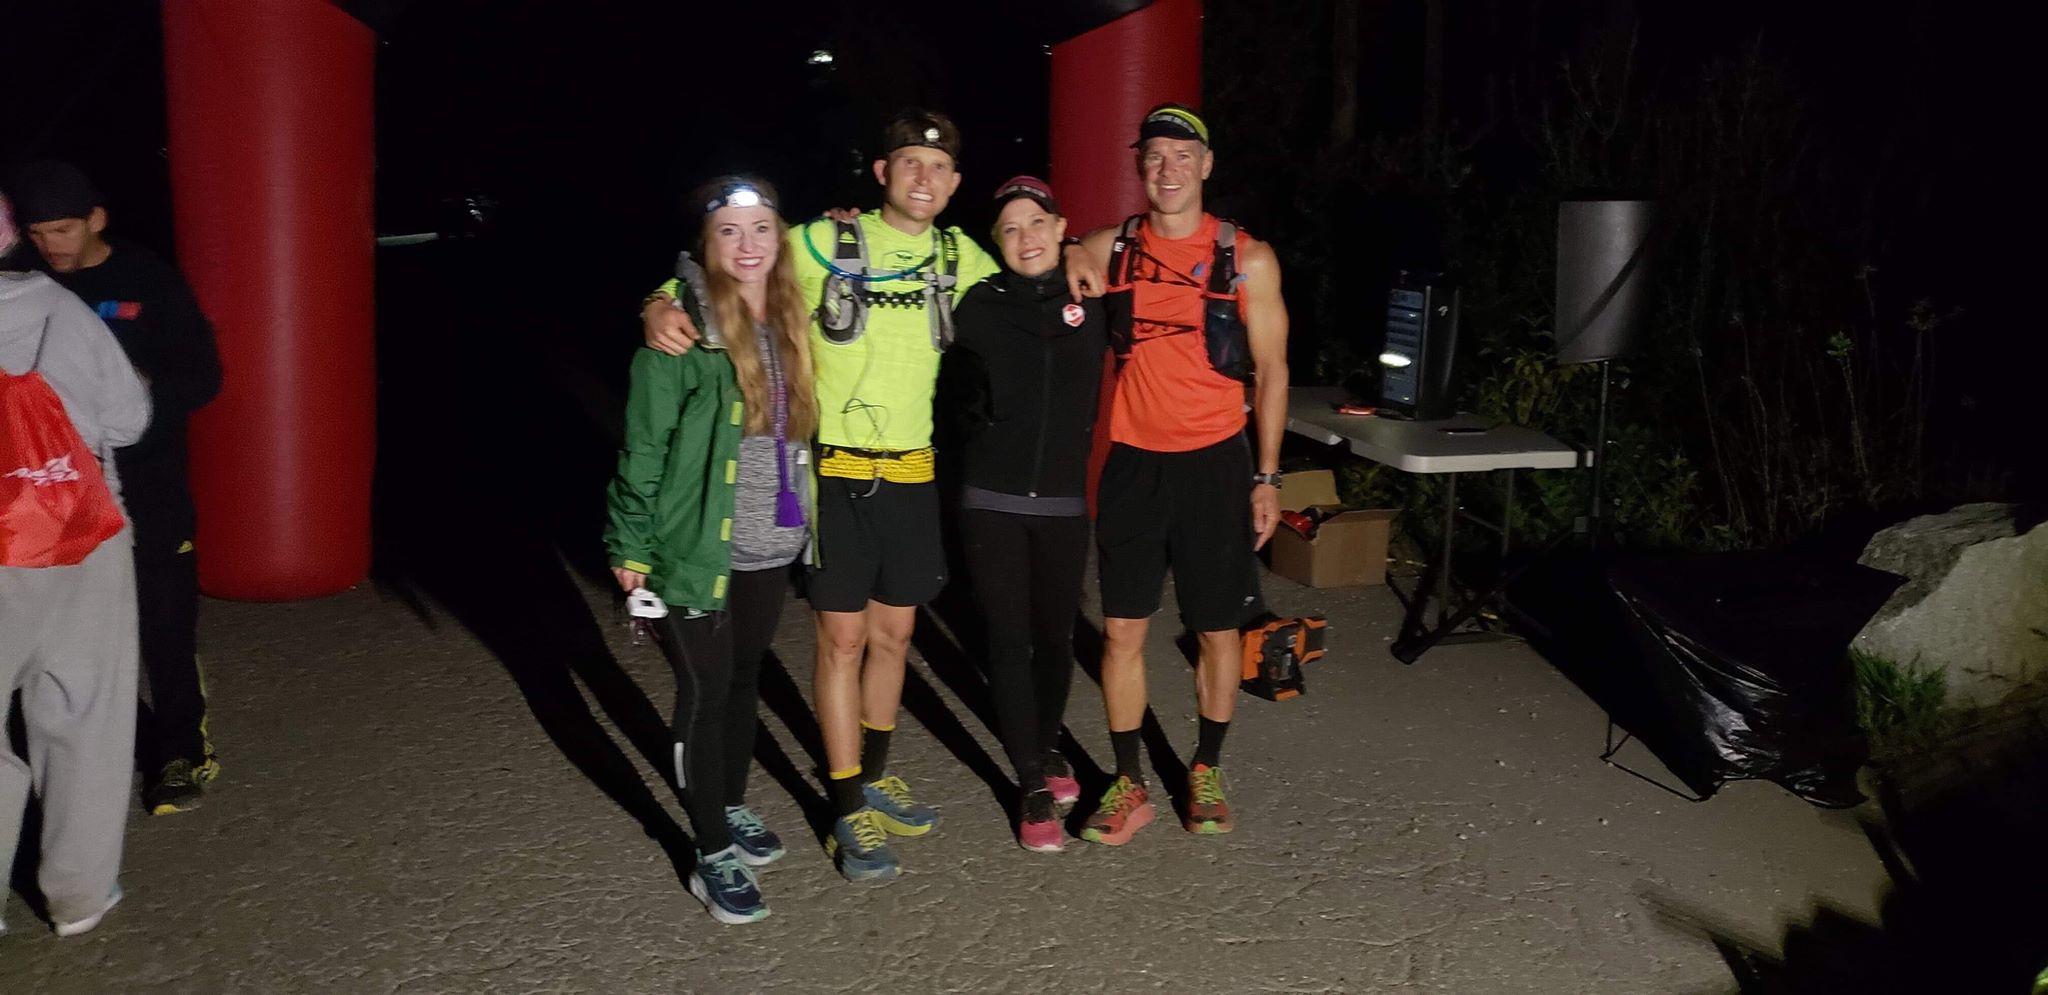 Coach_Terry_Wilson_Pursuit_of_The_Perfect_Race_Utahs_Toughest_Rory_Duckworth_Finish_Line_Salt_Lake_Tri_Club.jpg